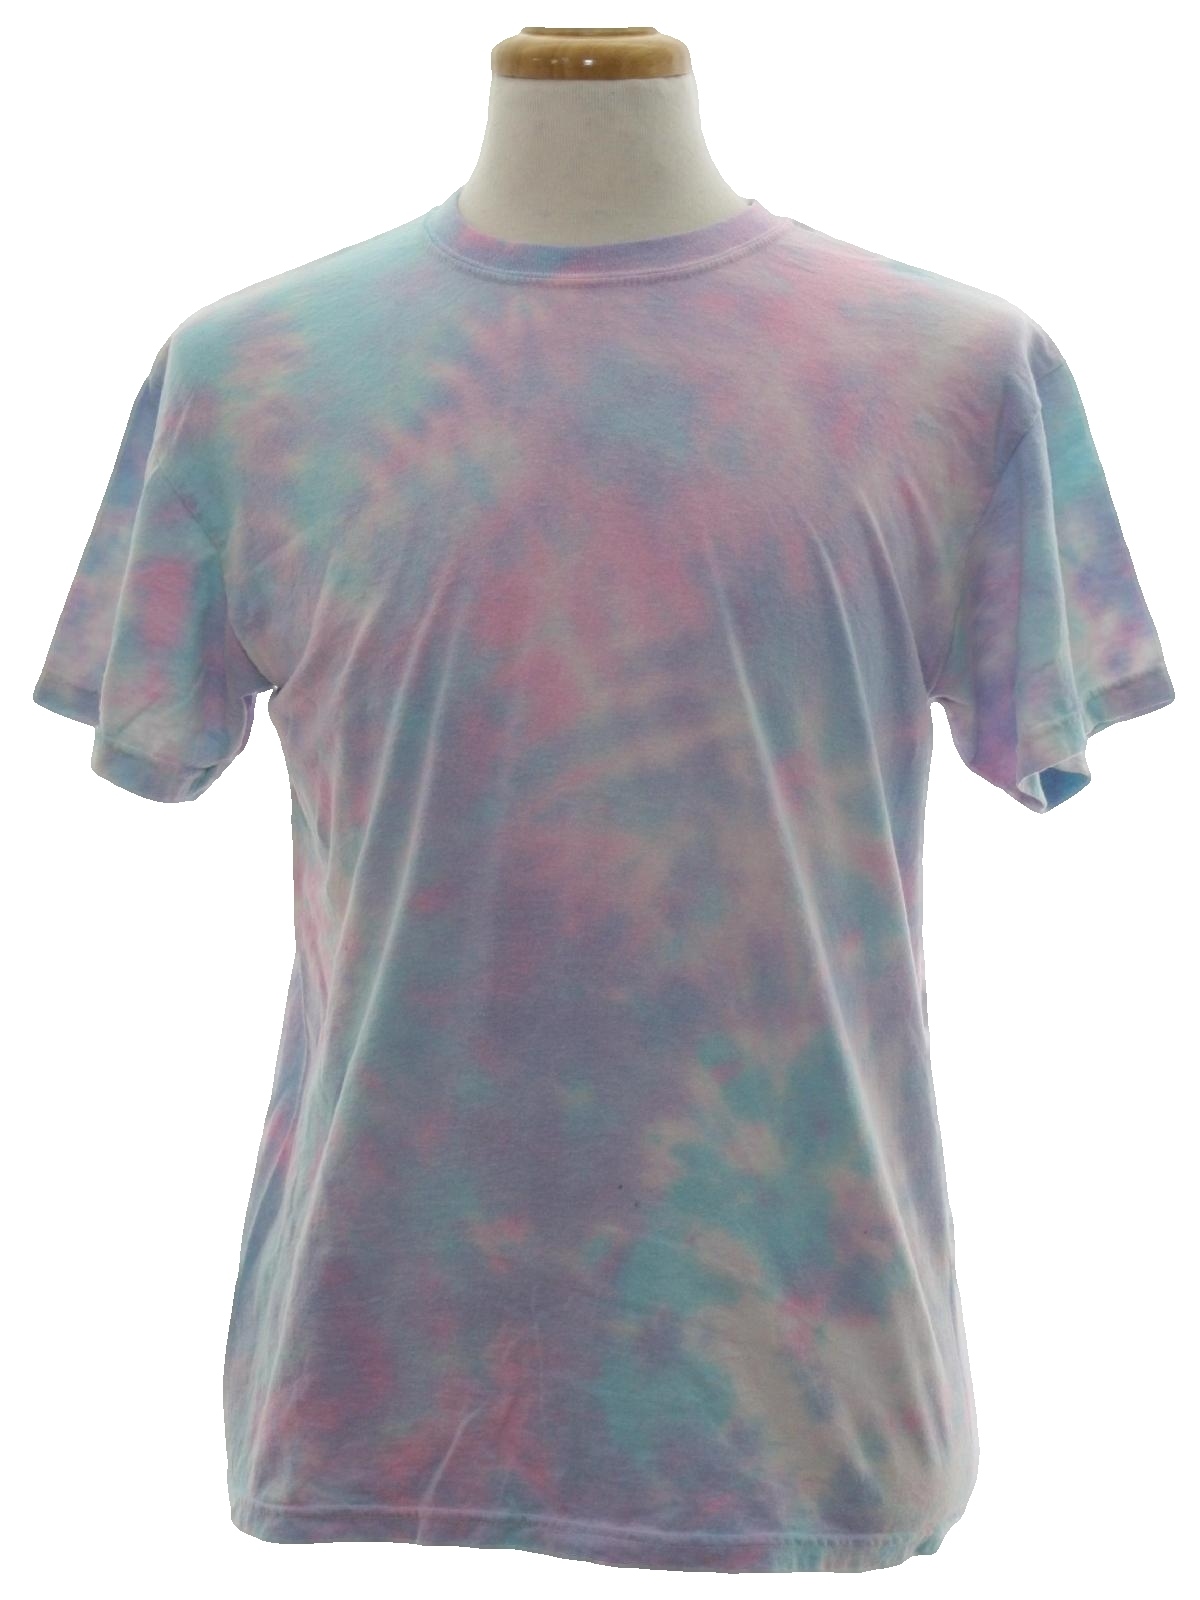 Vintage 1990 39 S T Shirt 90s Or Newer Gildan Unisex White